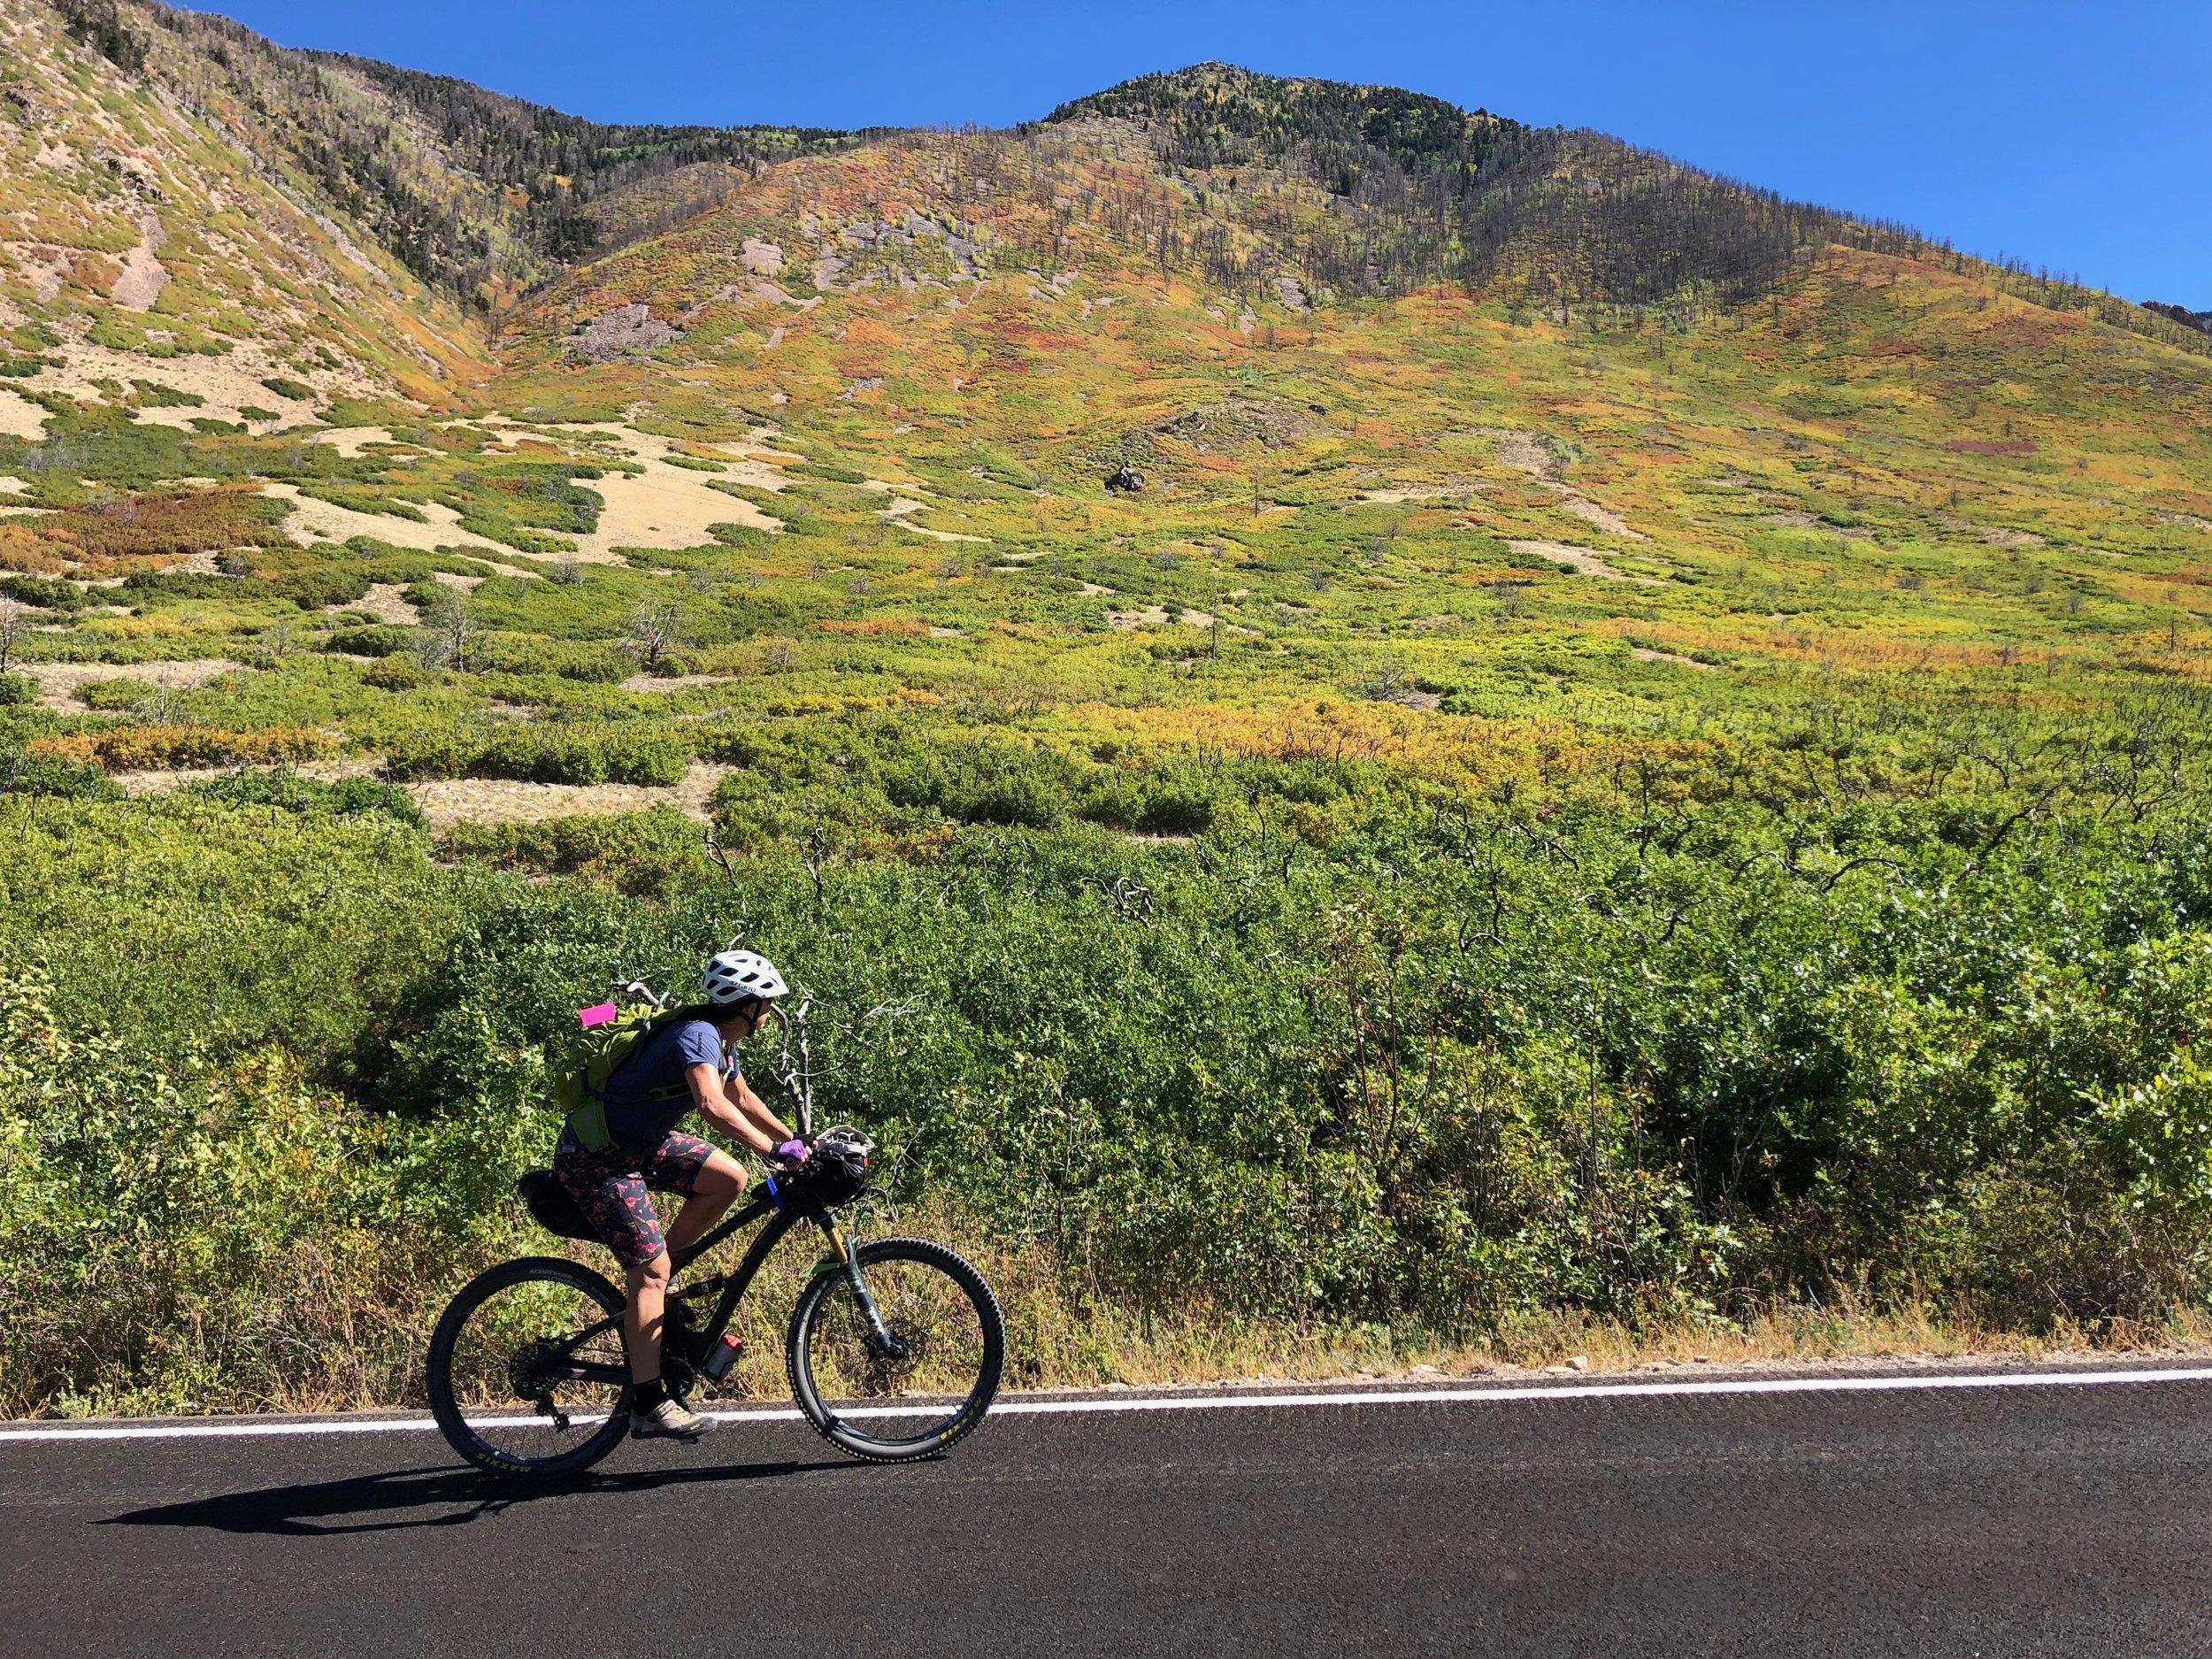 Fall colors in the La Sal Mountains of Utah.